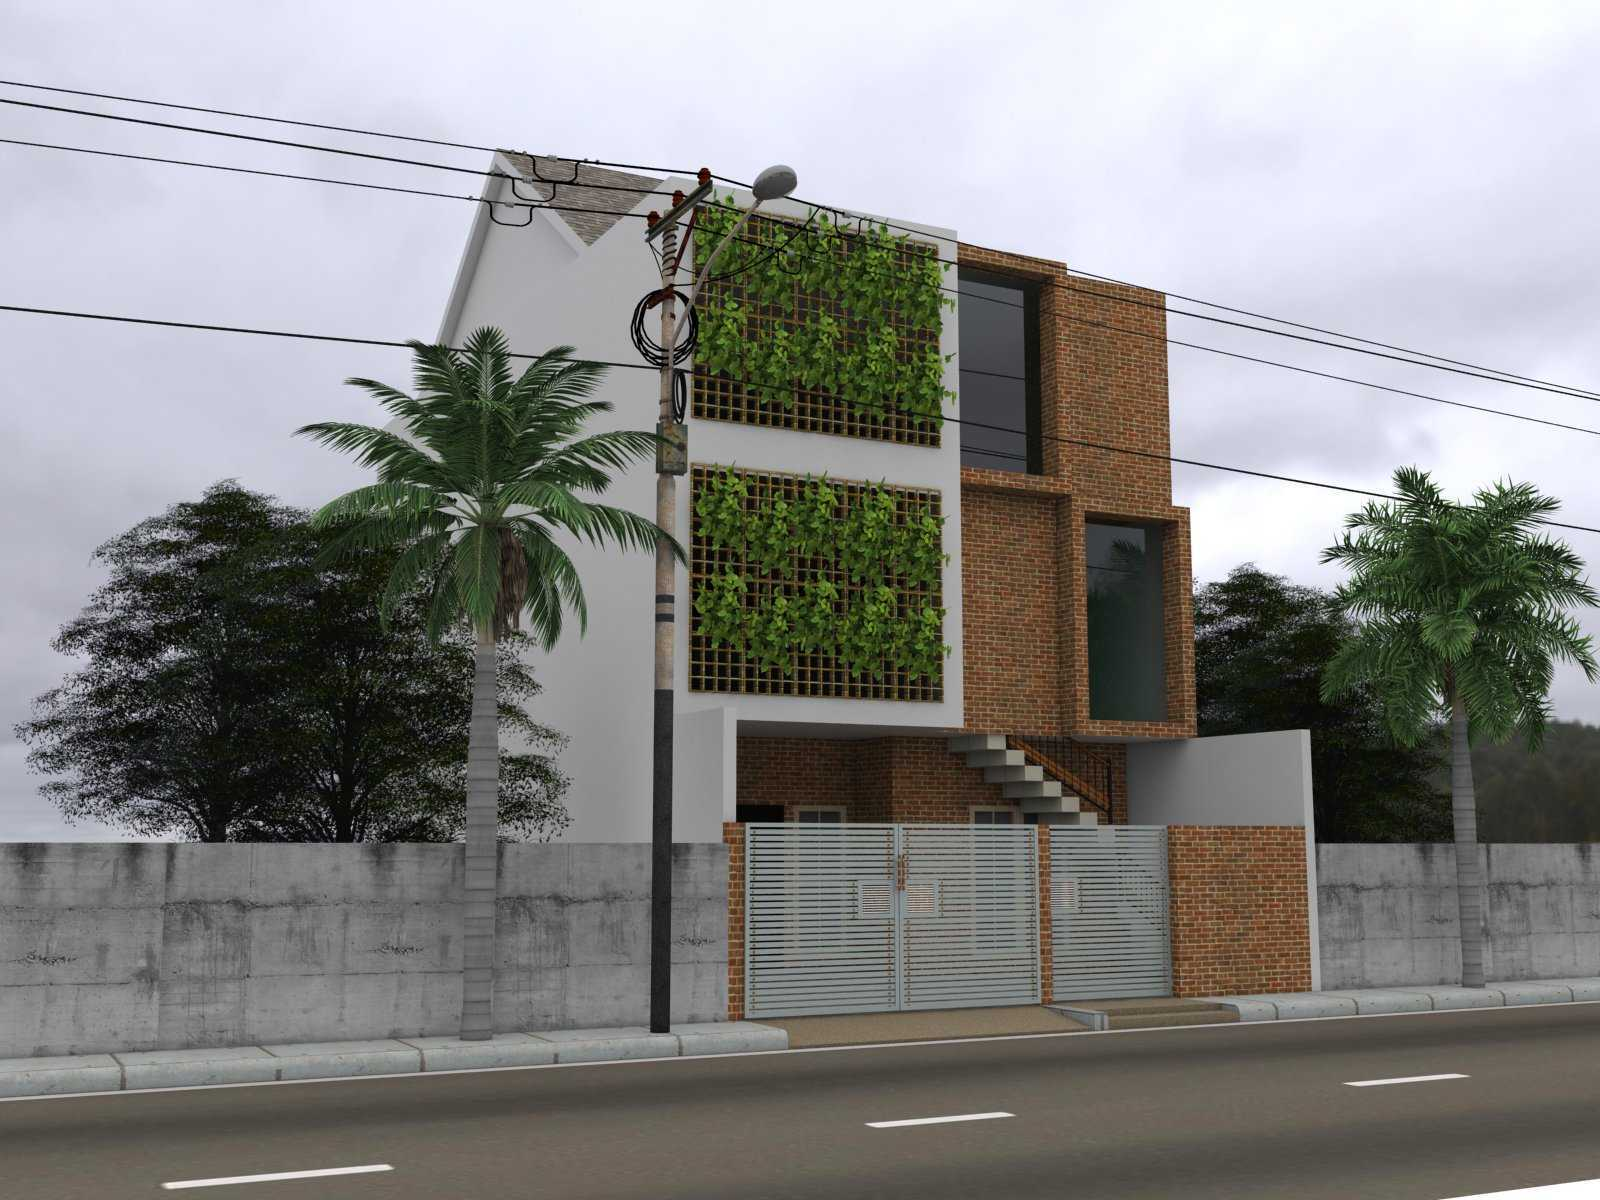 Lilac Creative Rumah Jakarta Pusat Jakarta Pusat, Kota Jakarta Pusat, Daerah Khusus Ibukota Jakarta, Indonesia Jakarta Pusat, Kota Jakarta Pusat, Daerah Khusus Ibukota Jakarta, Indonesia Lilac-Creative-Rumah-Jakarta-Pusat   72180